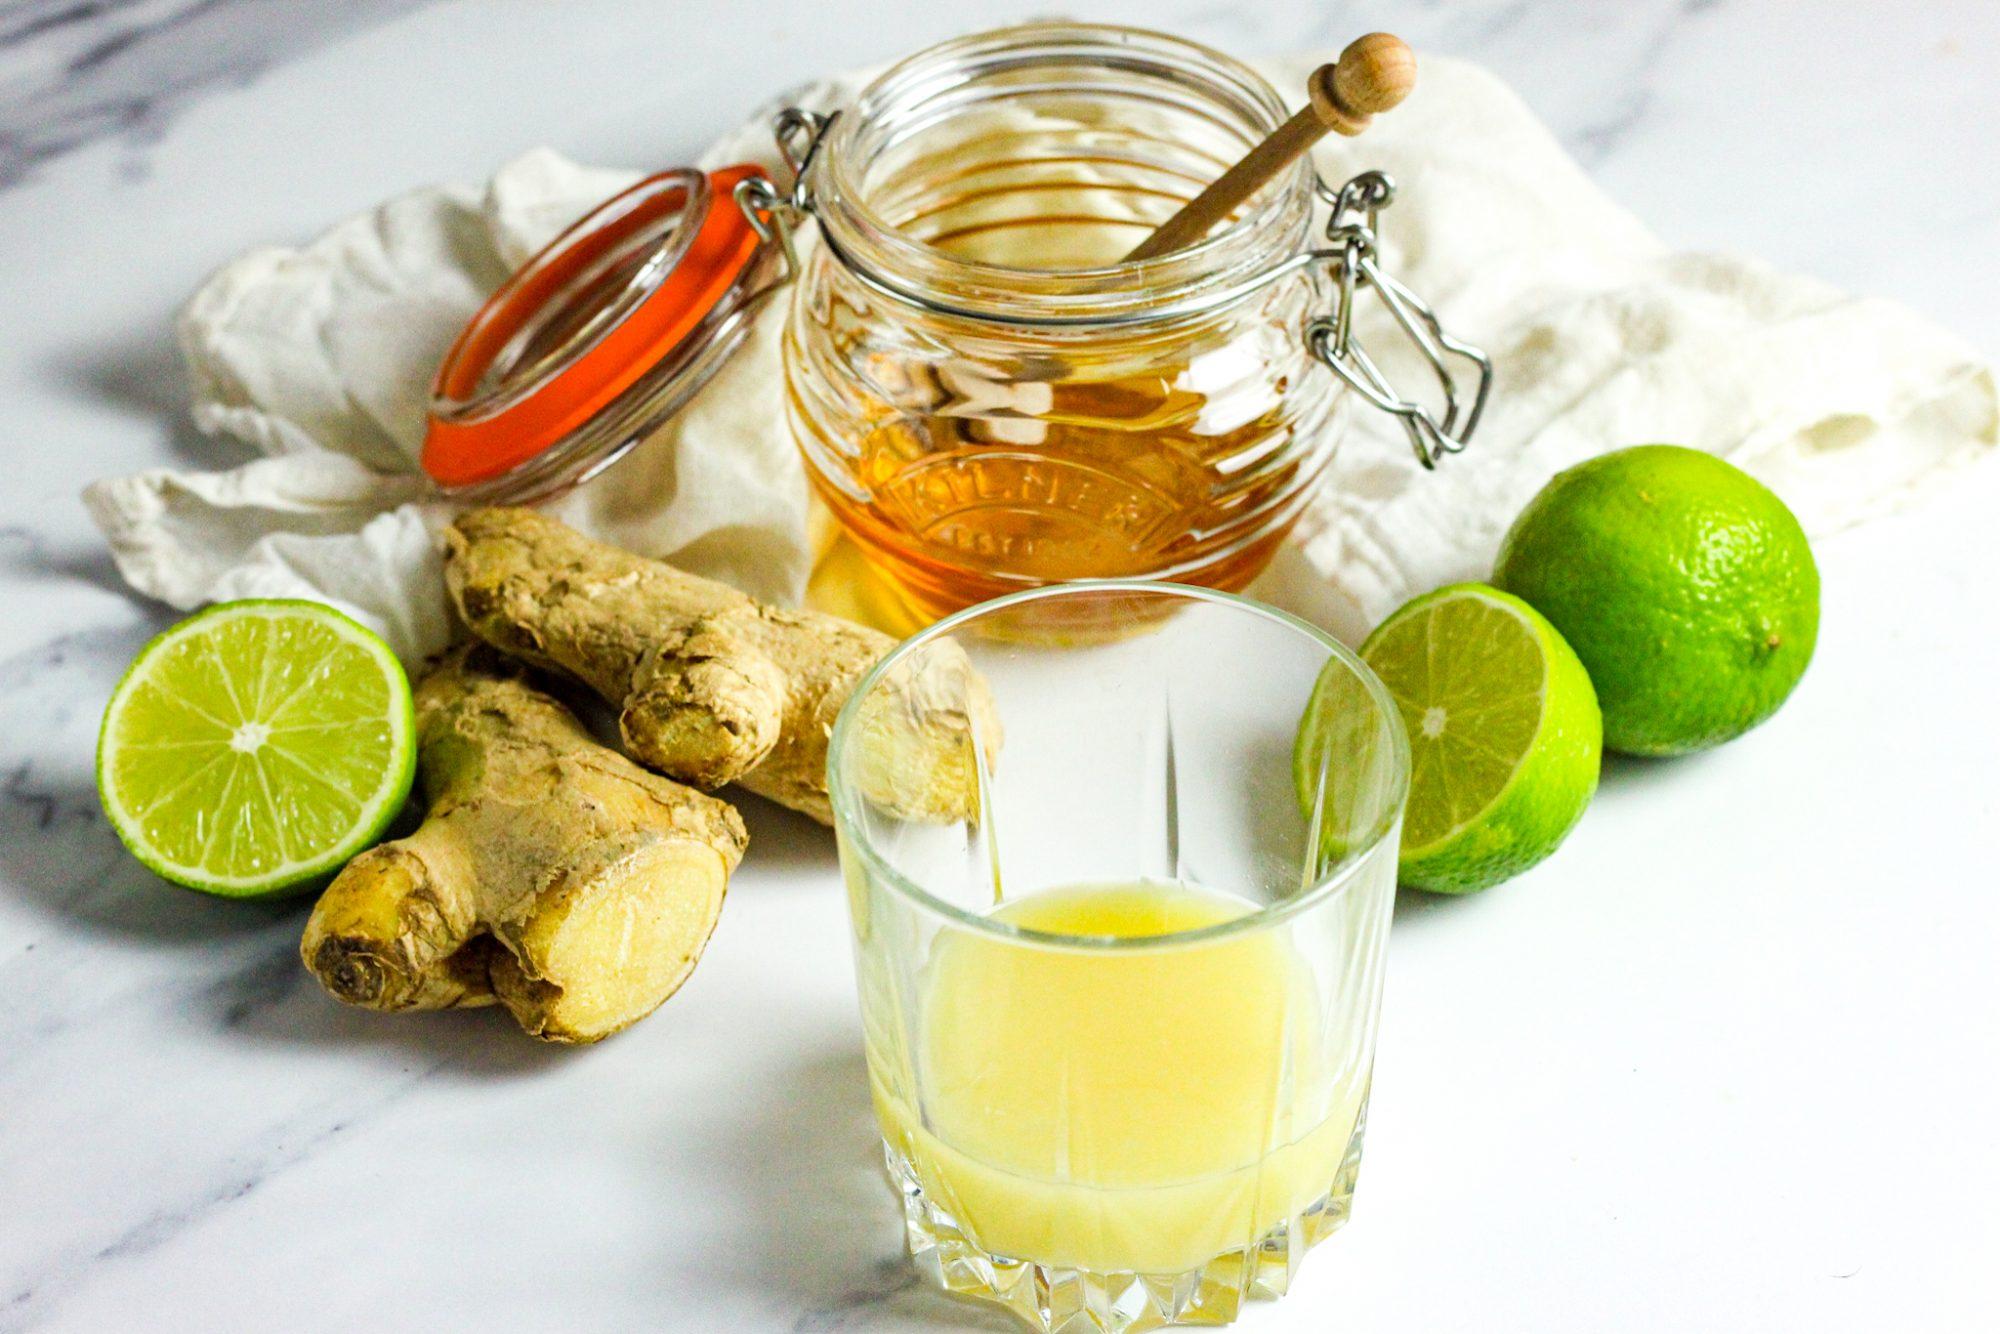 3 ingredient Ginger shots